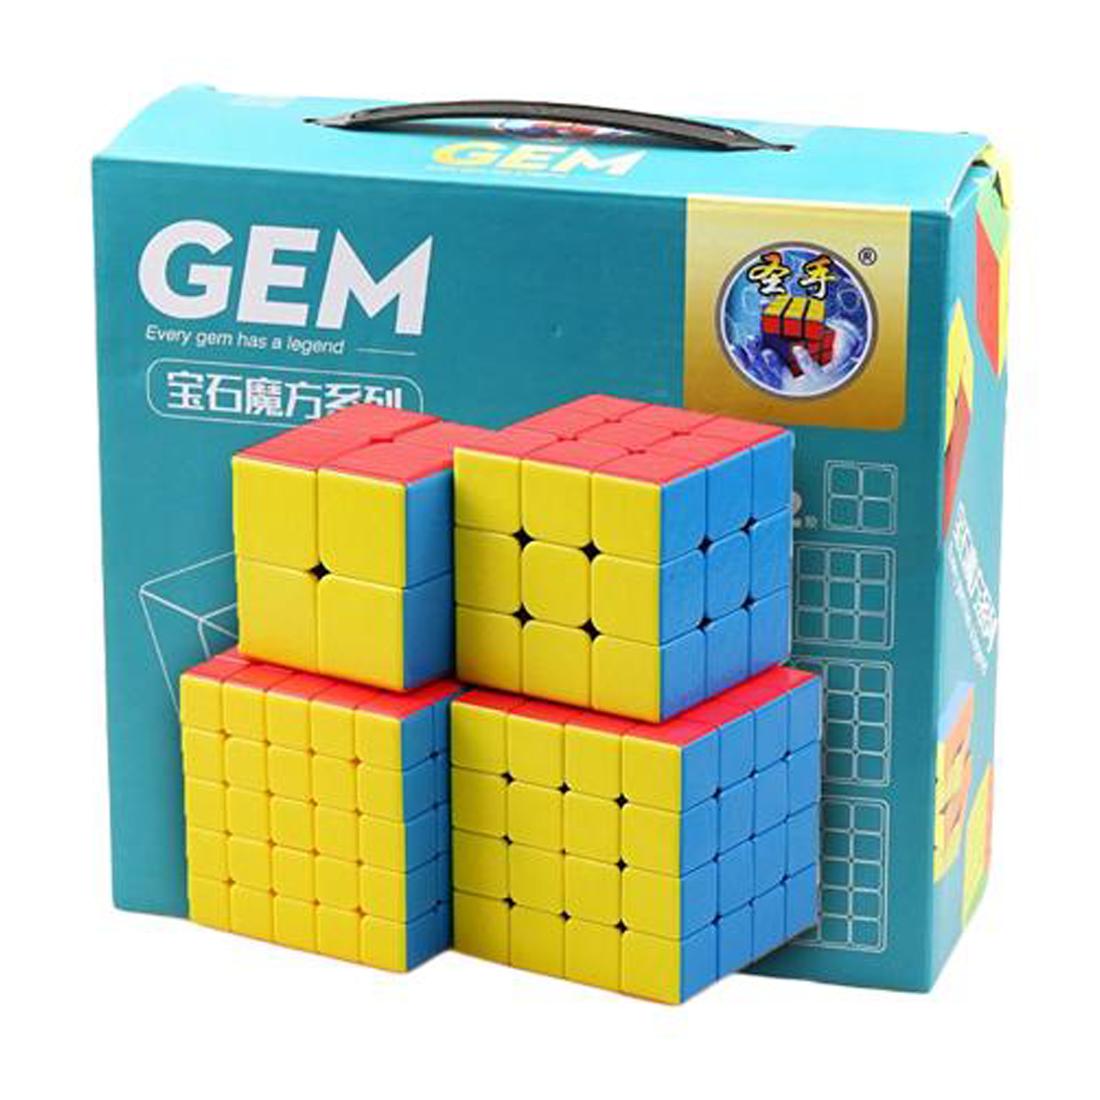 ss_gem_gift_box_01